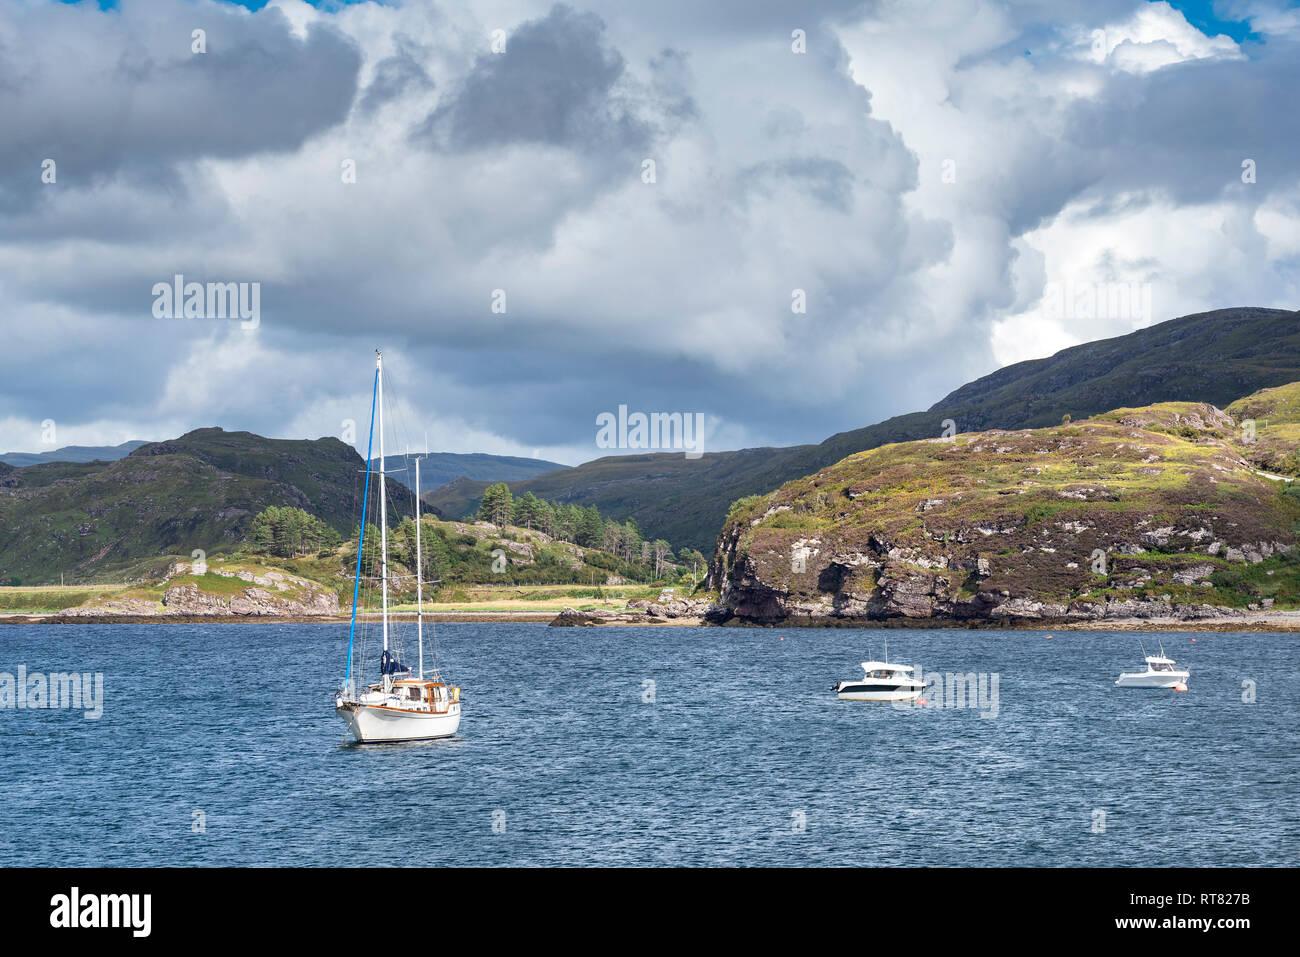 United Kingdom, Scotland, Sutherland, Caithness, Loch Kanaird - Stock Image